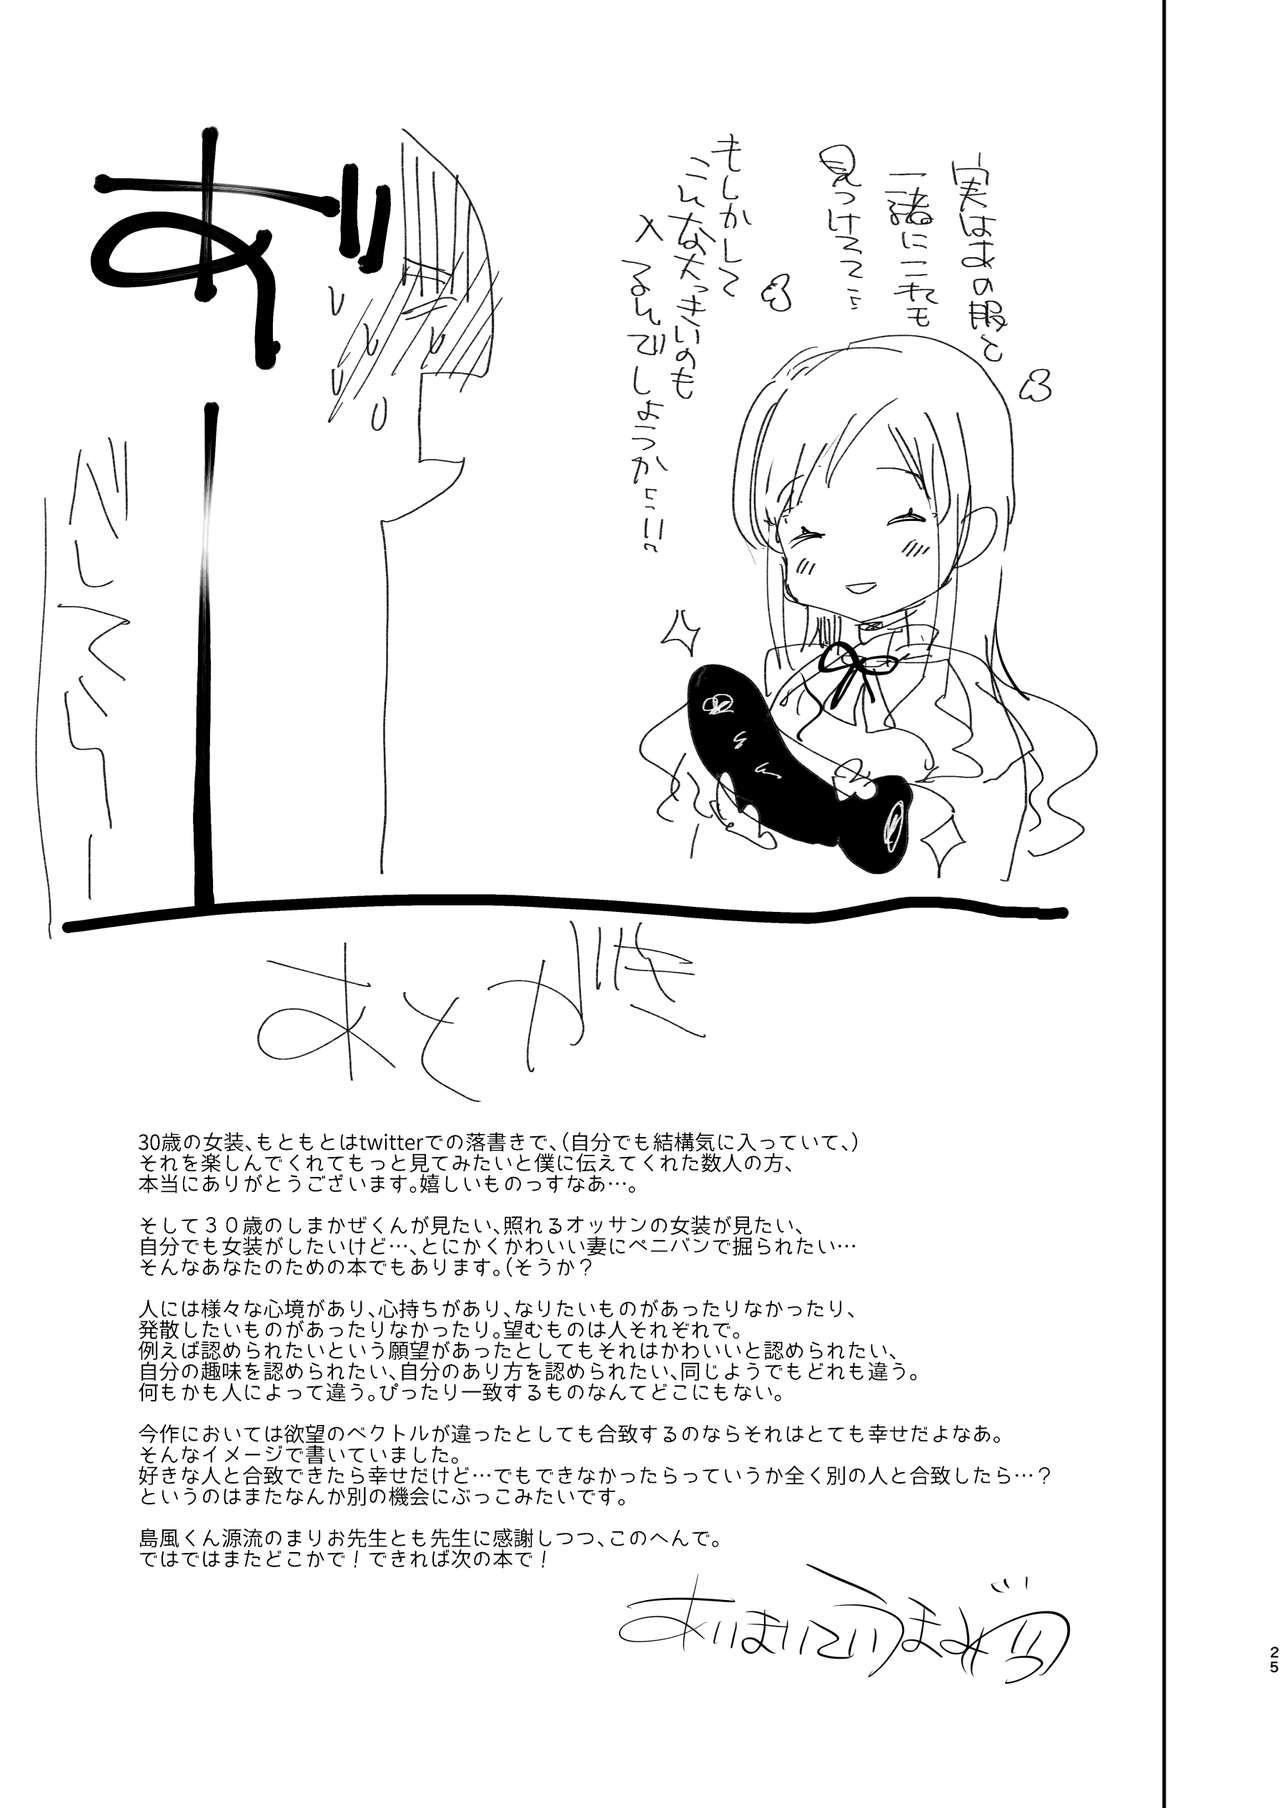 [Aimaitei (Aimaitei Umami)] Otto wa Shimakaze-kun 30-sai [Digital] 24